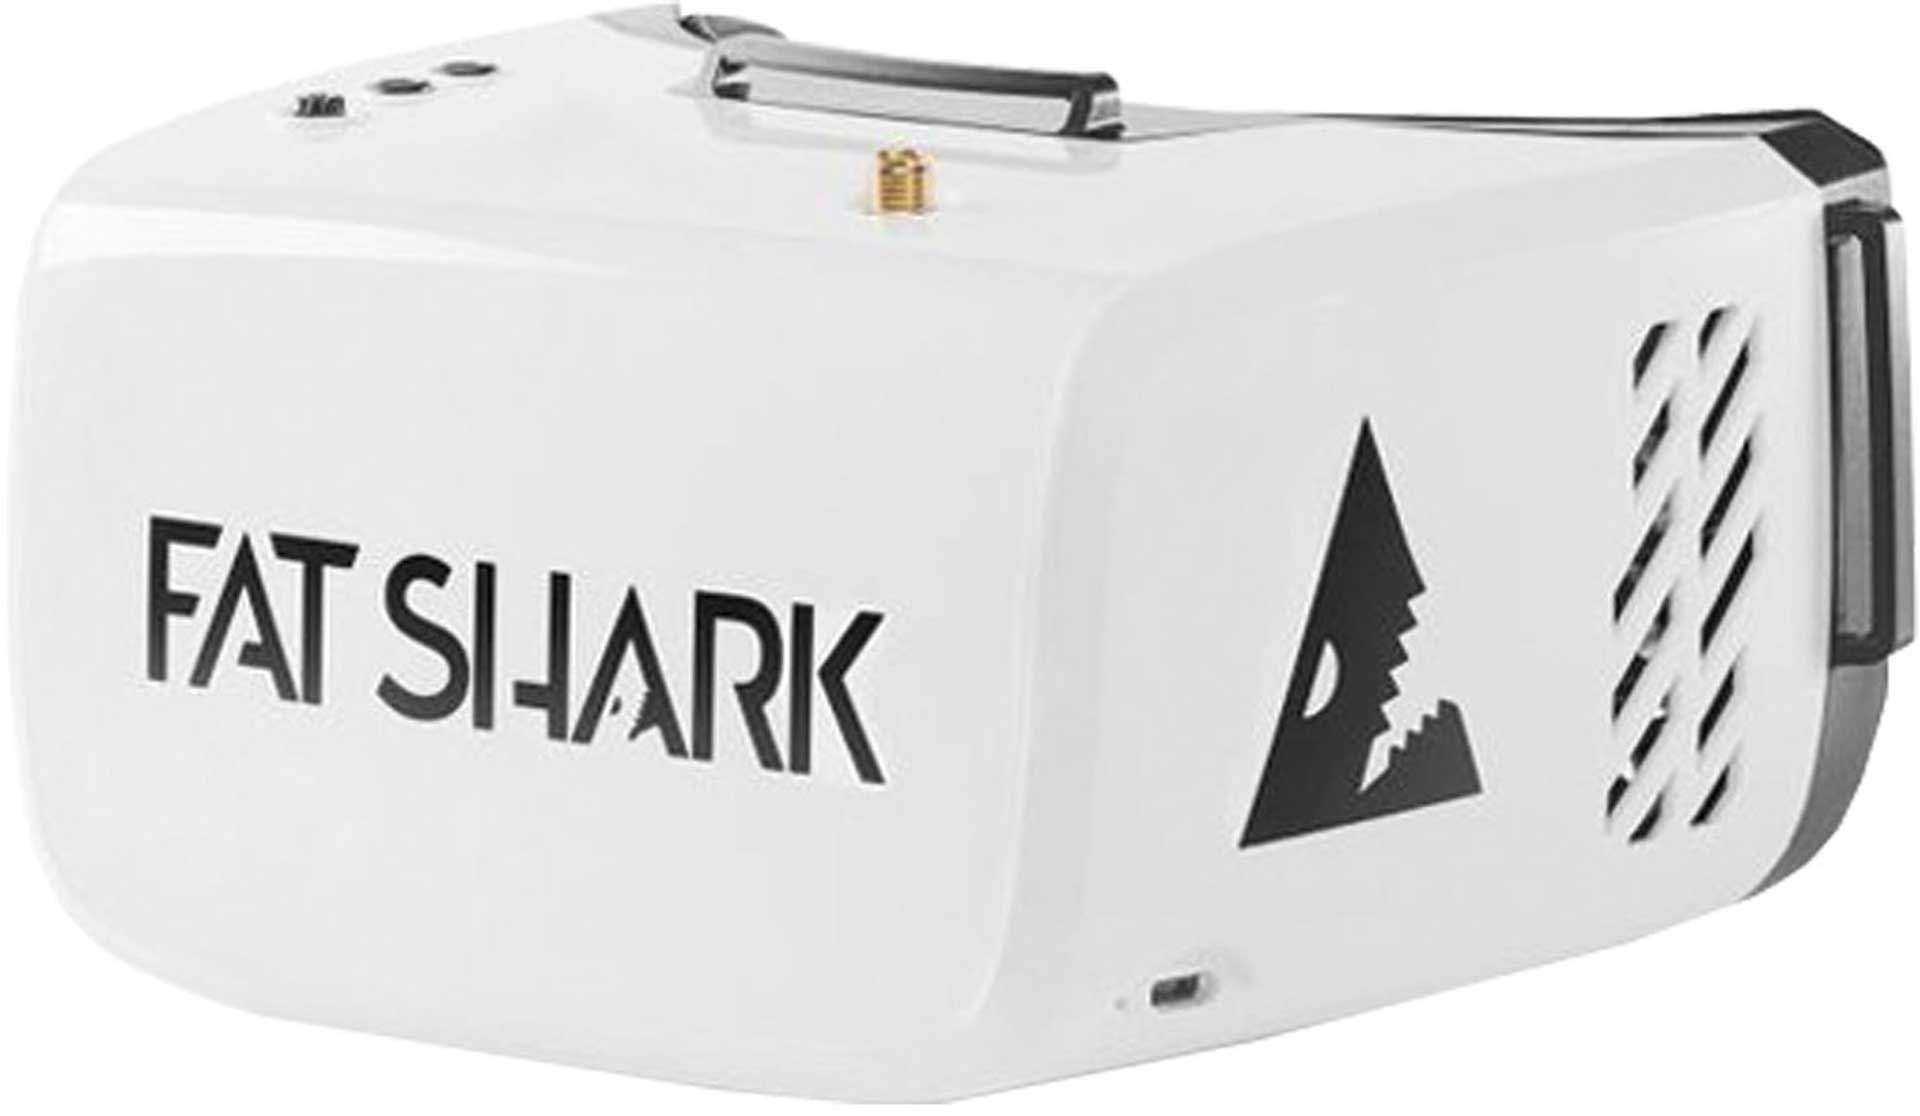 FAT SHARK RECON GOGGLE V2